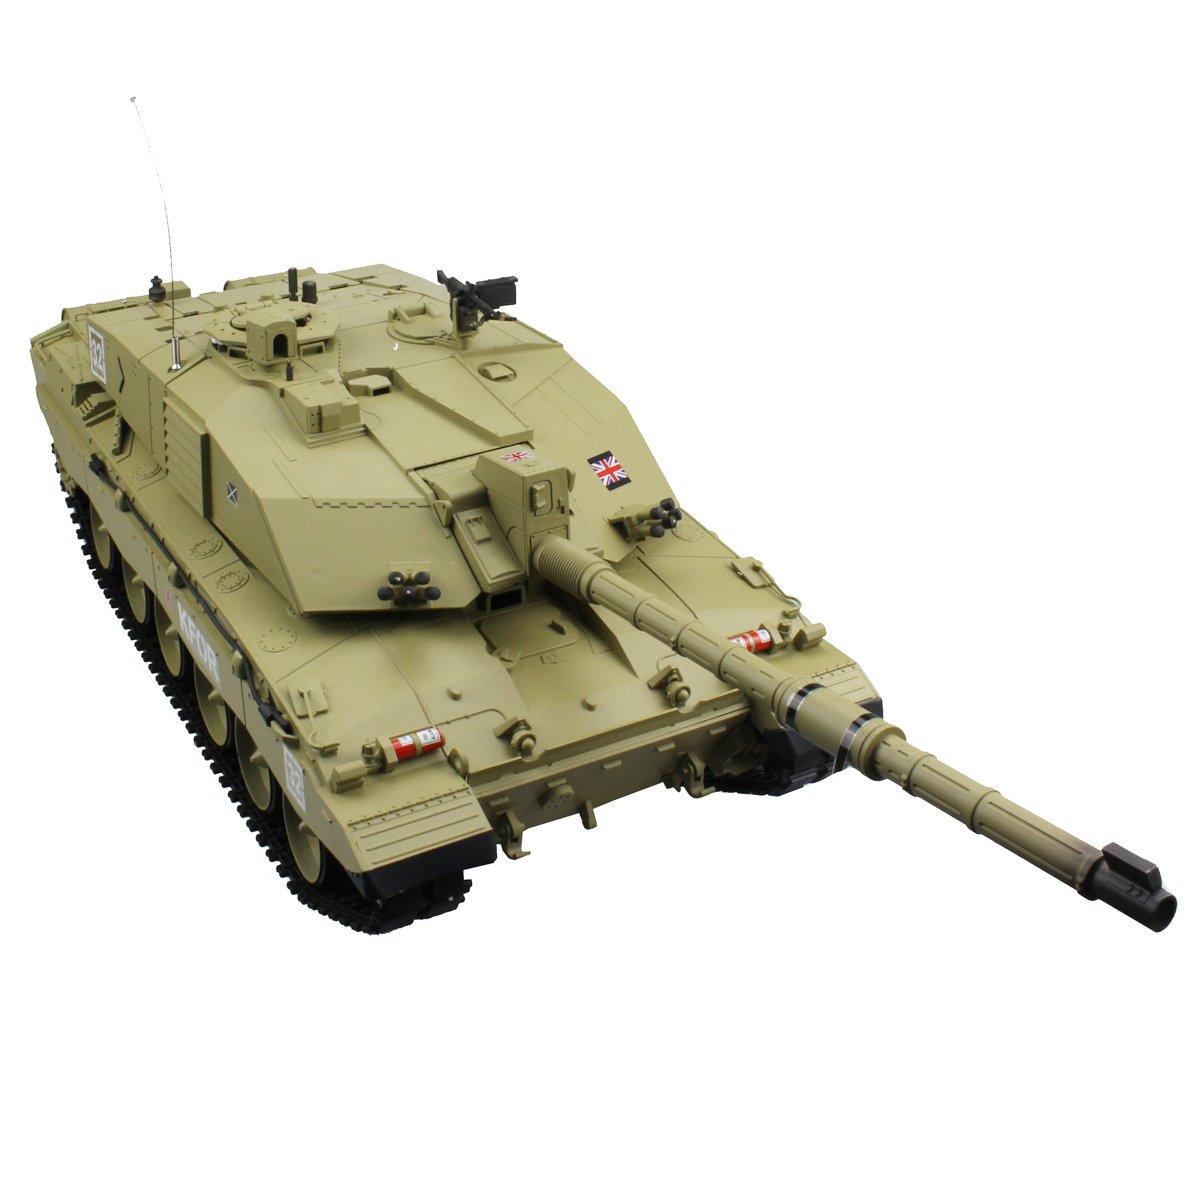 472bbfda0e87 Hugine 2.4Ghz 1 16 Emulational British Challenger 2 RC Main Battle Tank  With Smoke